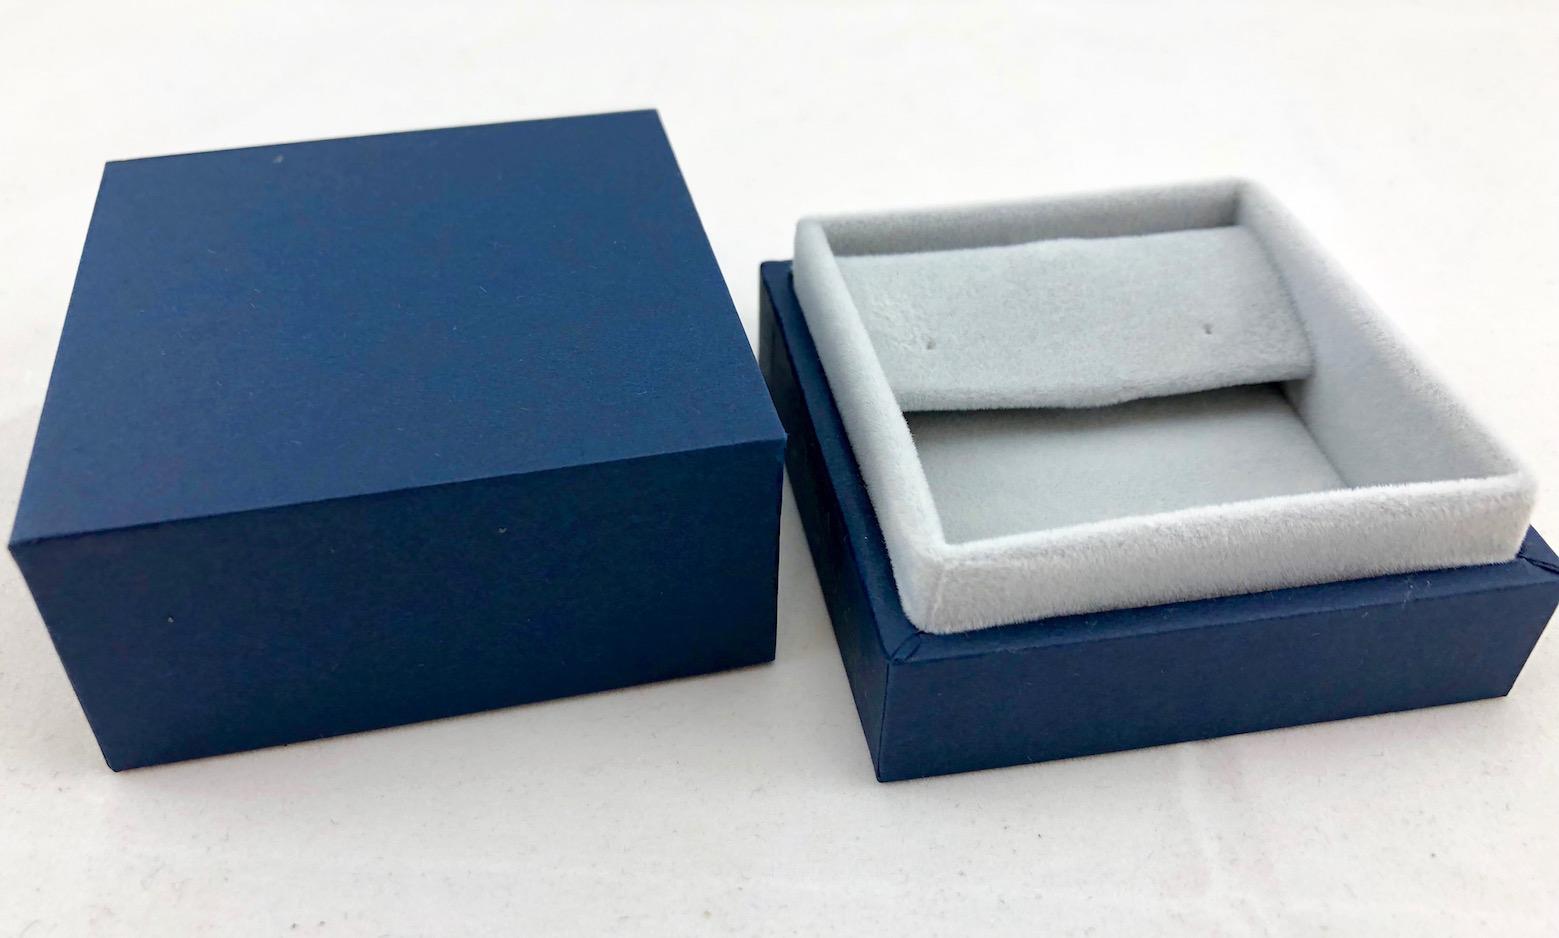 New Blue Envy Small Drop Earring Box